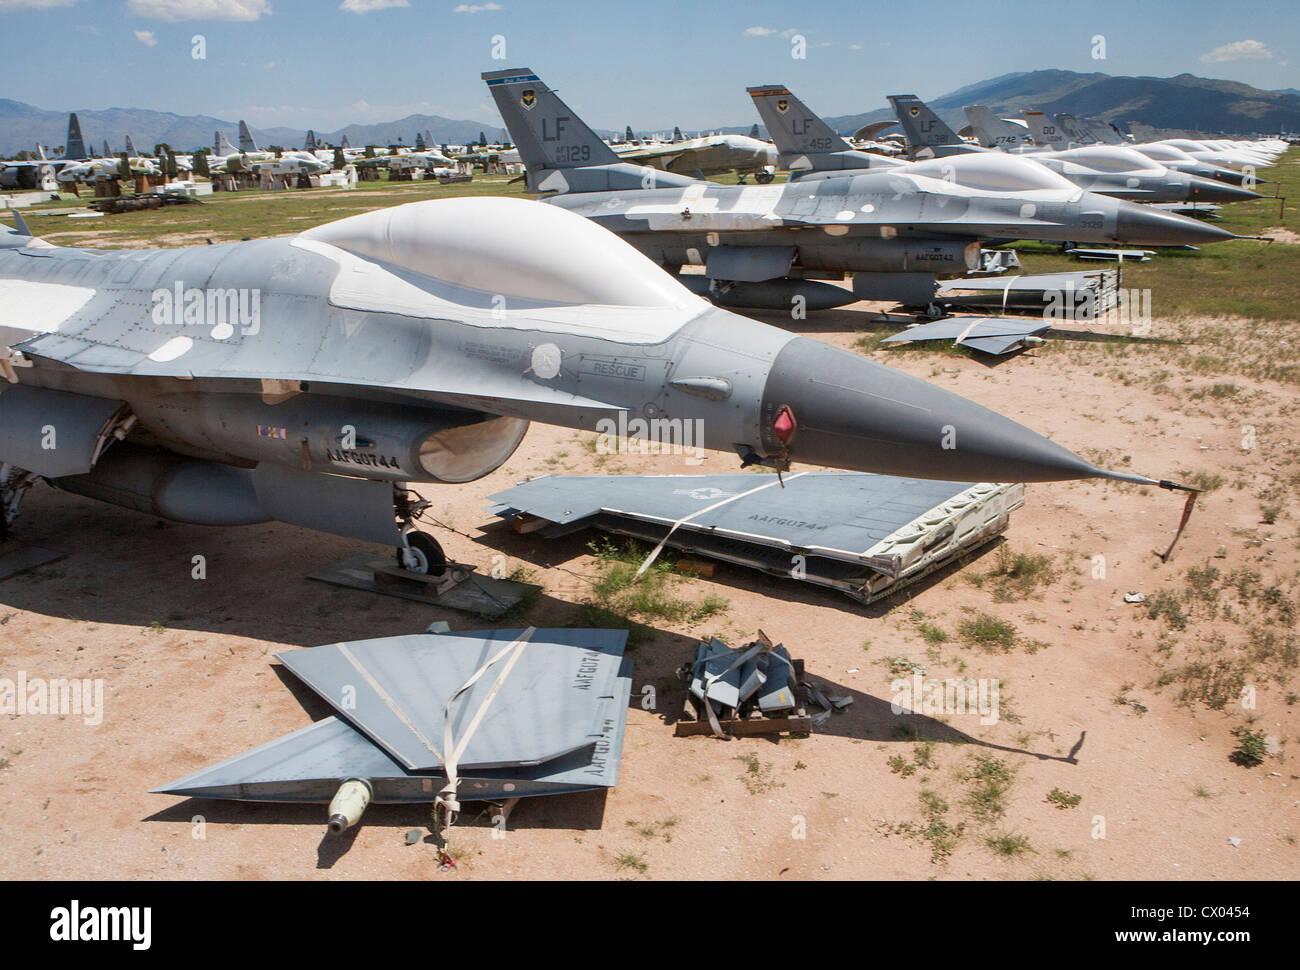 Northrop F-5E/F caza supersónico mexicano parte II - Página 4 F-16-fighting-falcon-aircraft-in-storage-at-the-309th-aerospace-maintenance-CX0454